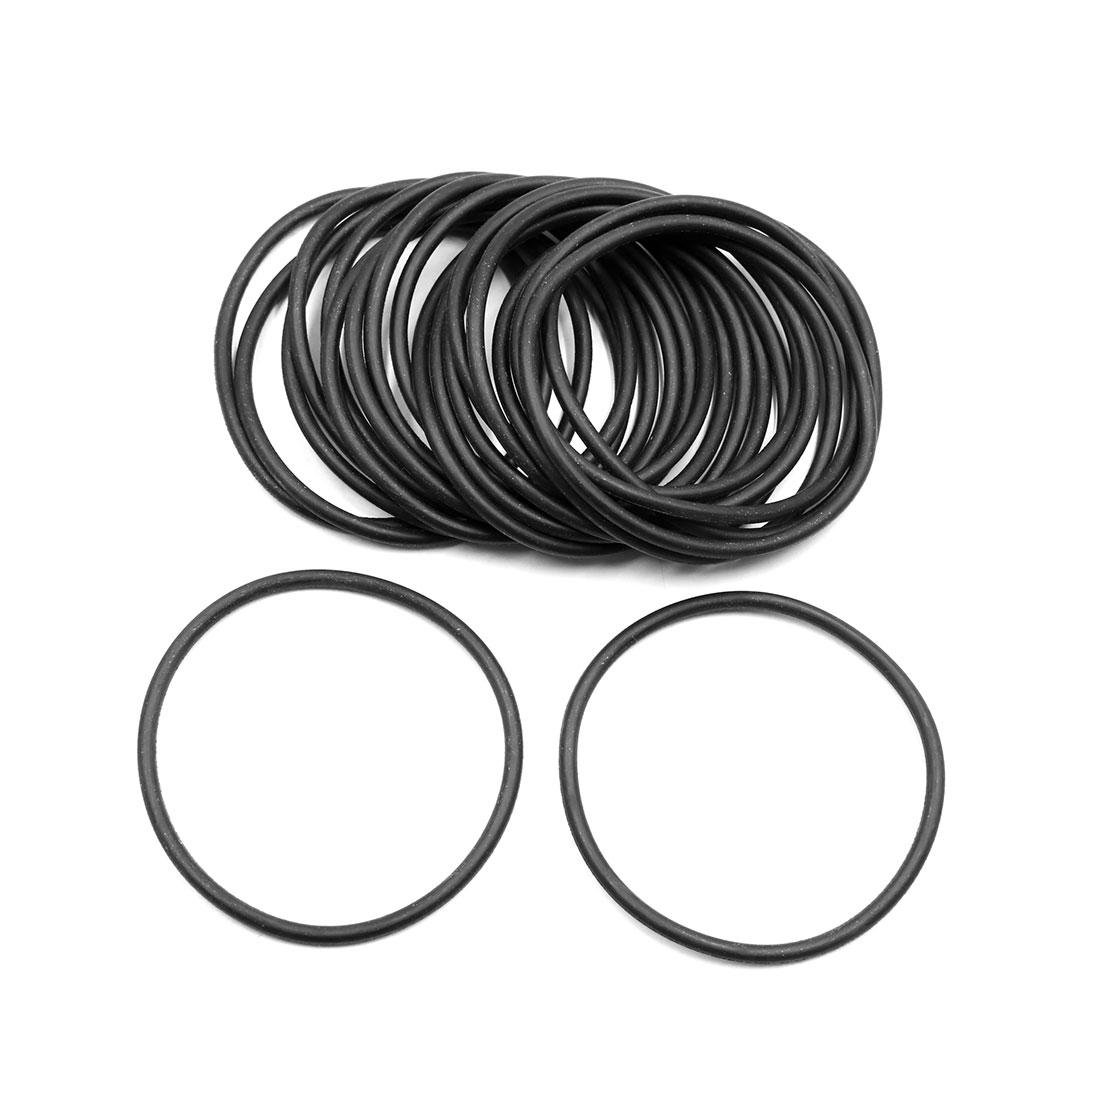 20pcs Black Universal Nitrile Rubber O-Ring Seals Gasket for Car 67 x 3.55mm